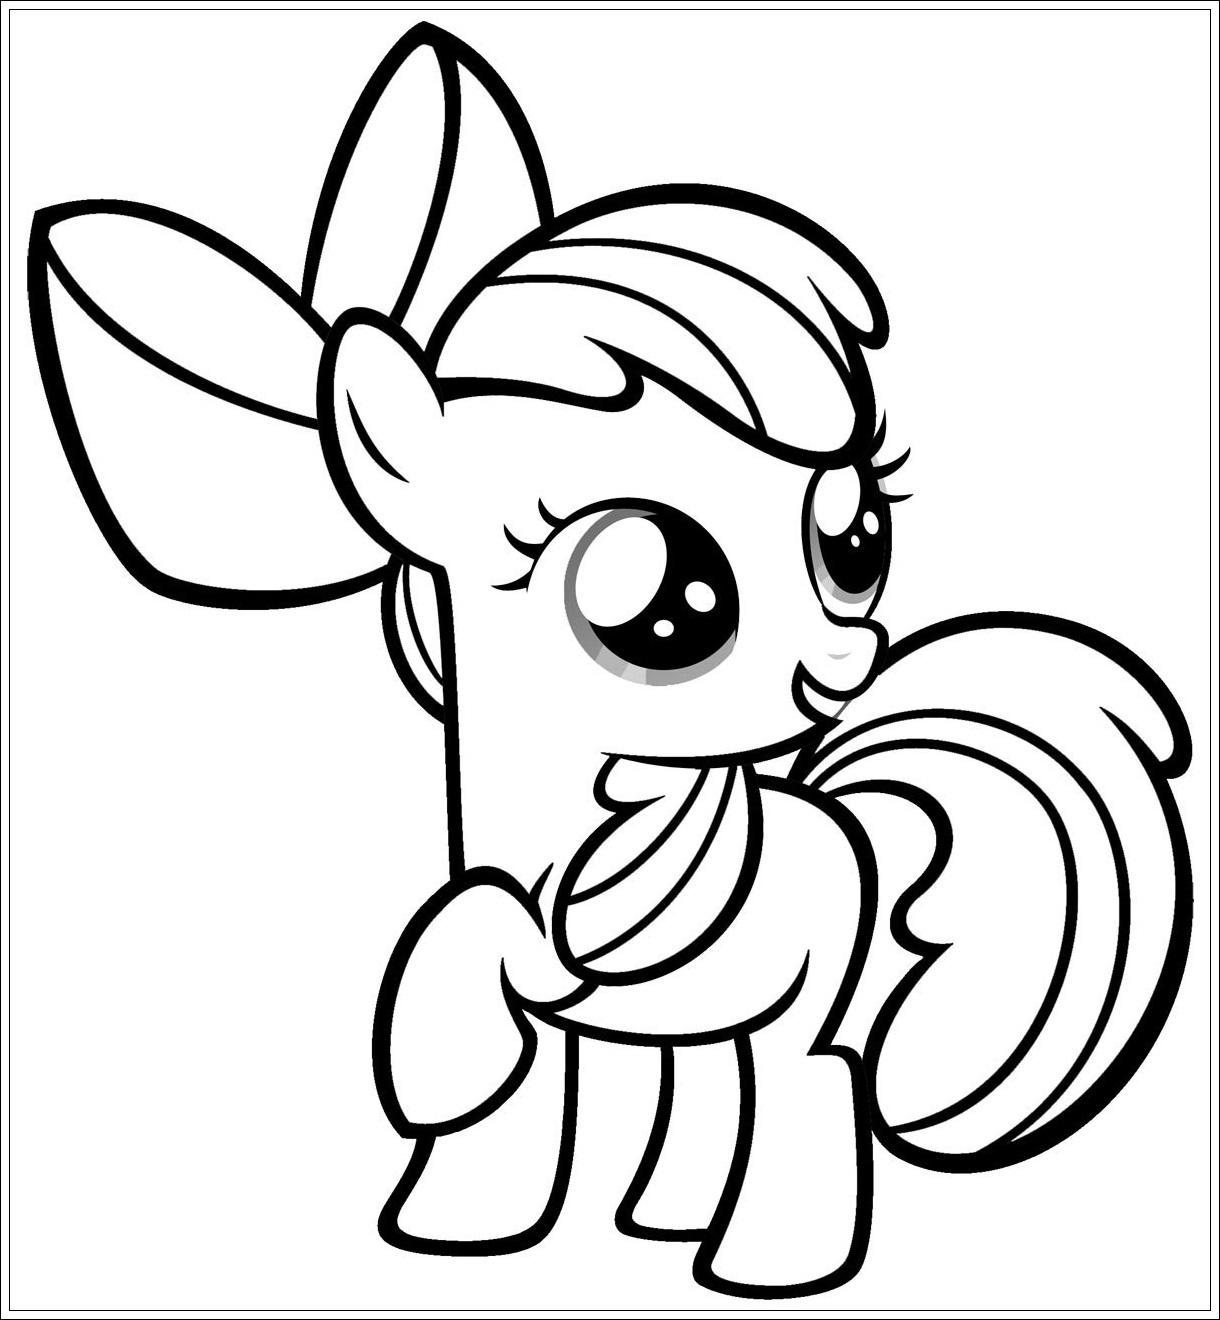 my little pony ausmalbilder # 10